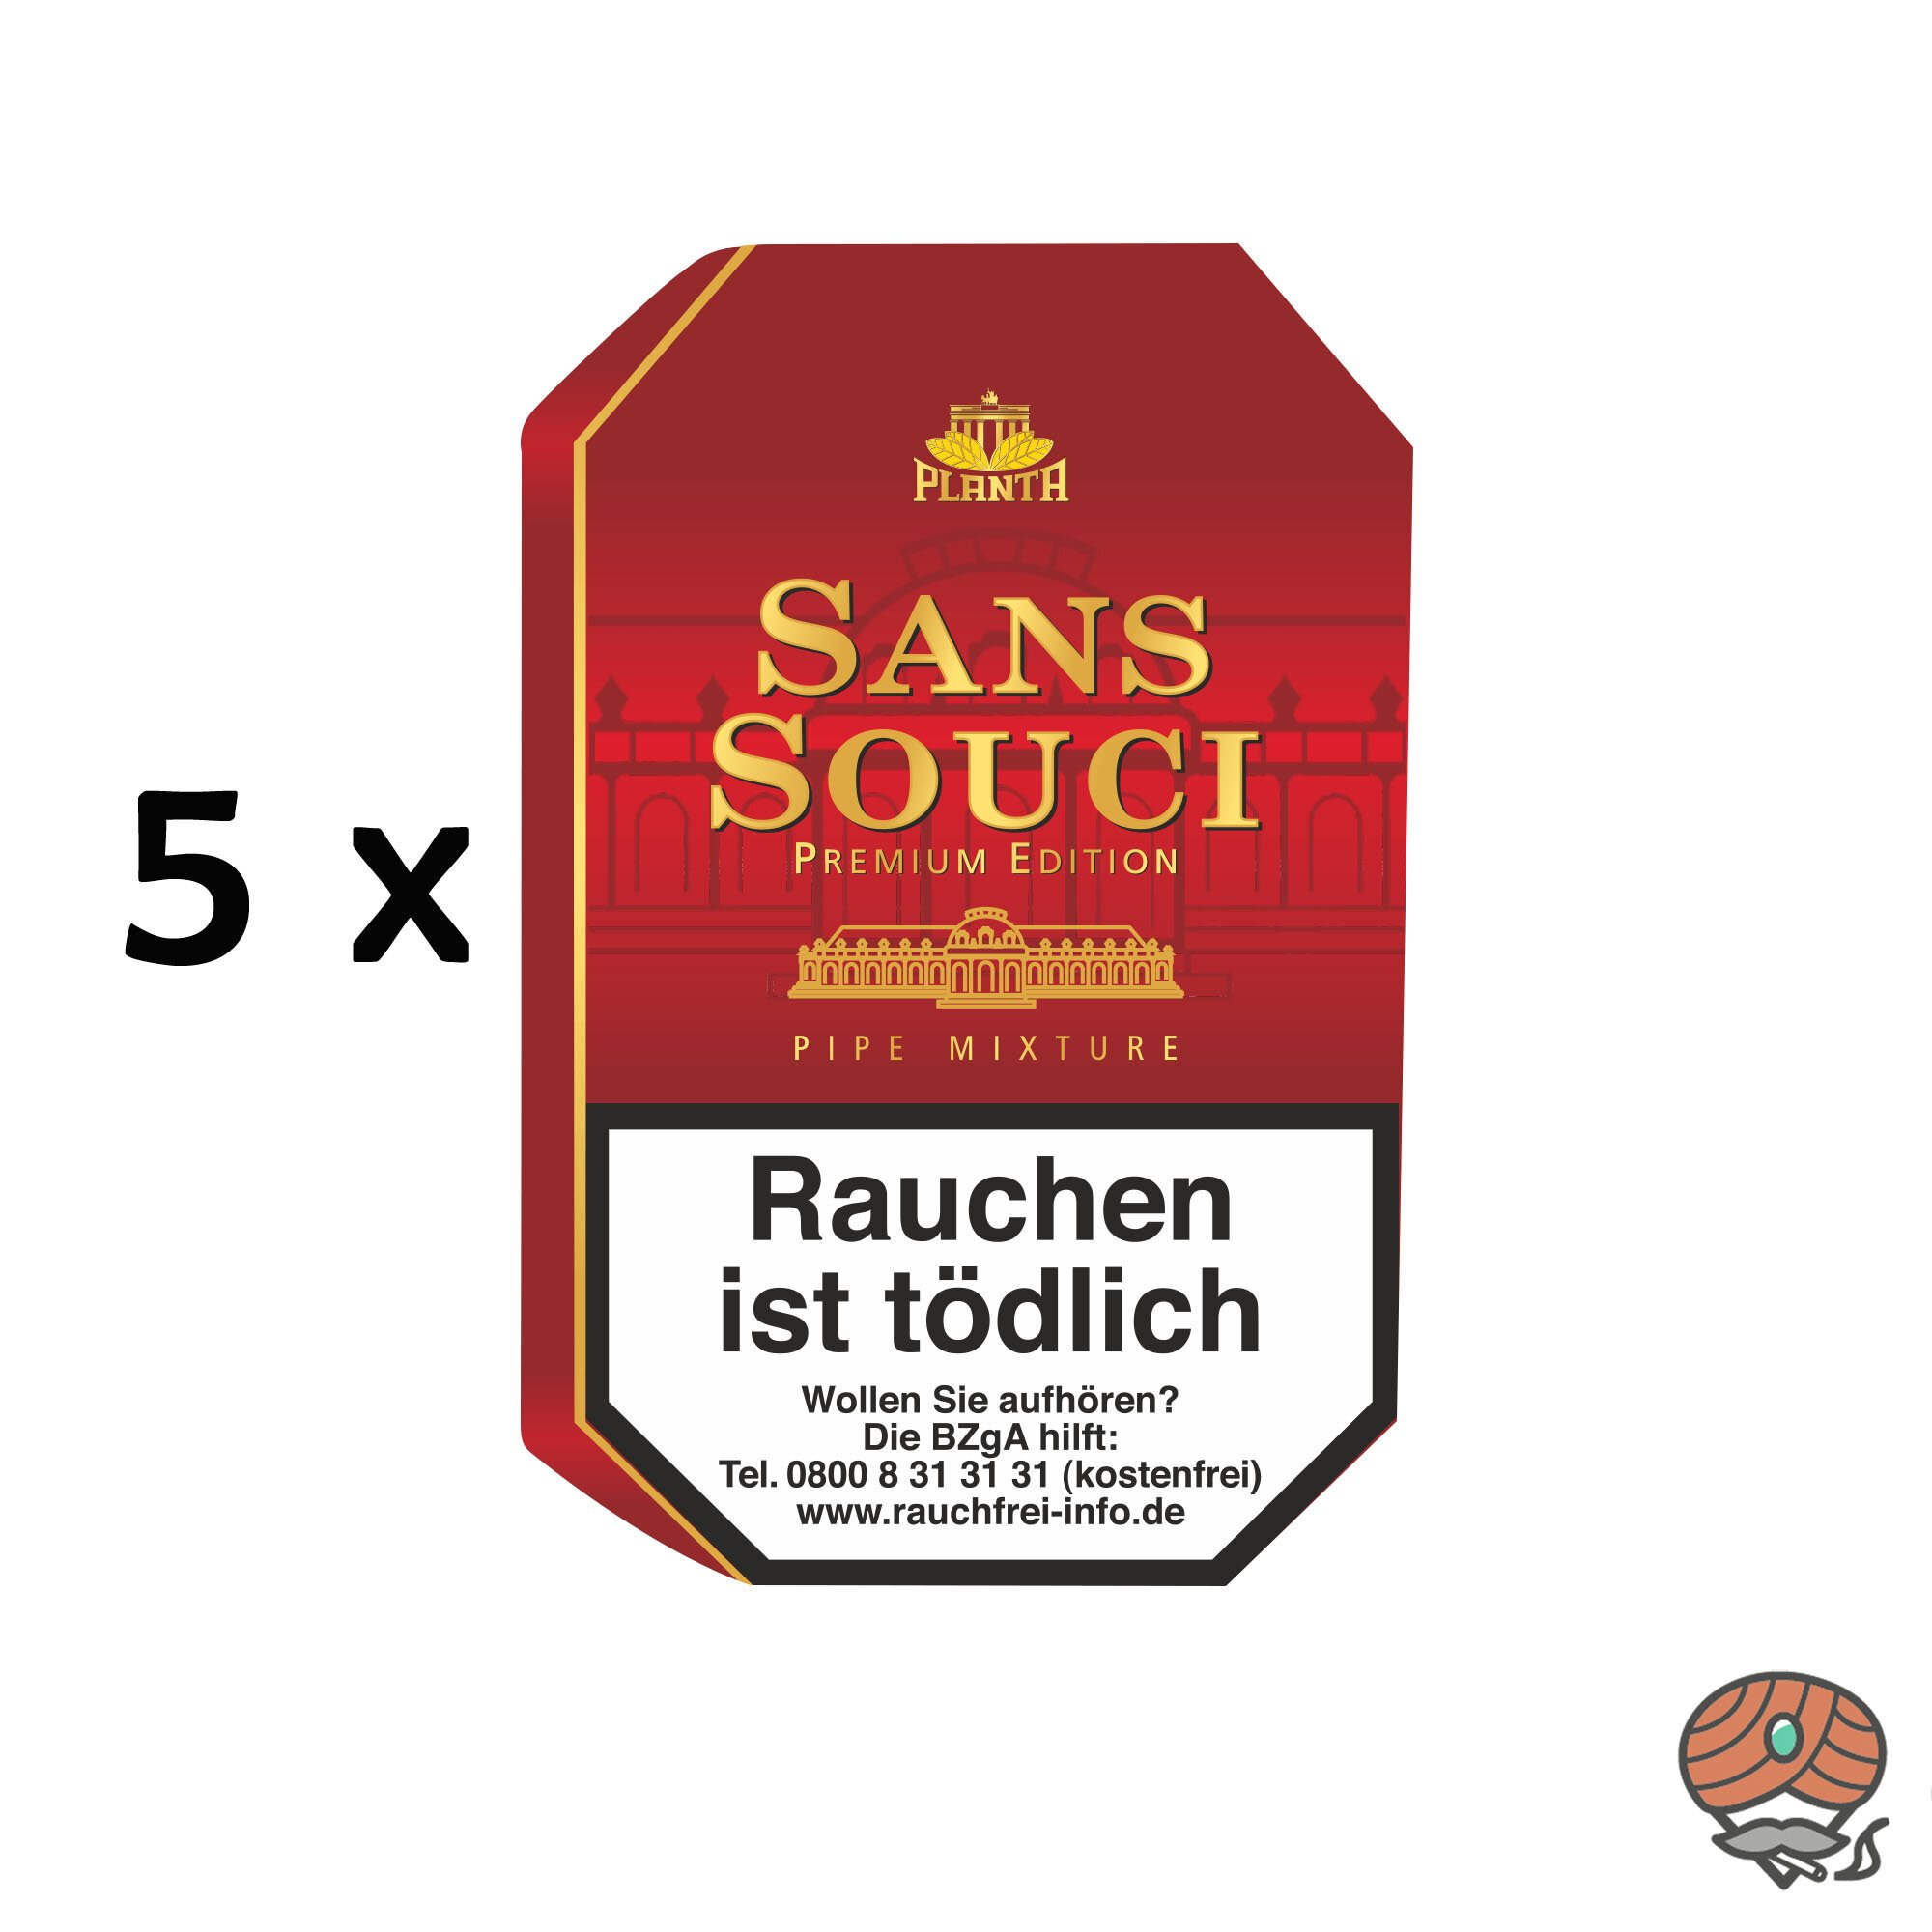 5 Dosen Sans Souci Pfeifentabak Premium Edition à 100g